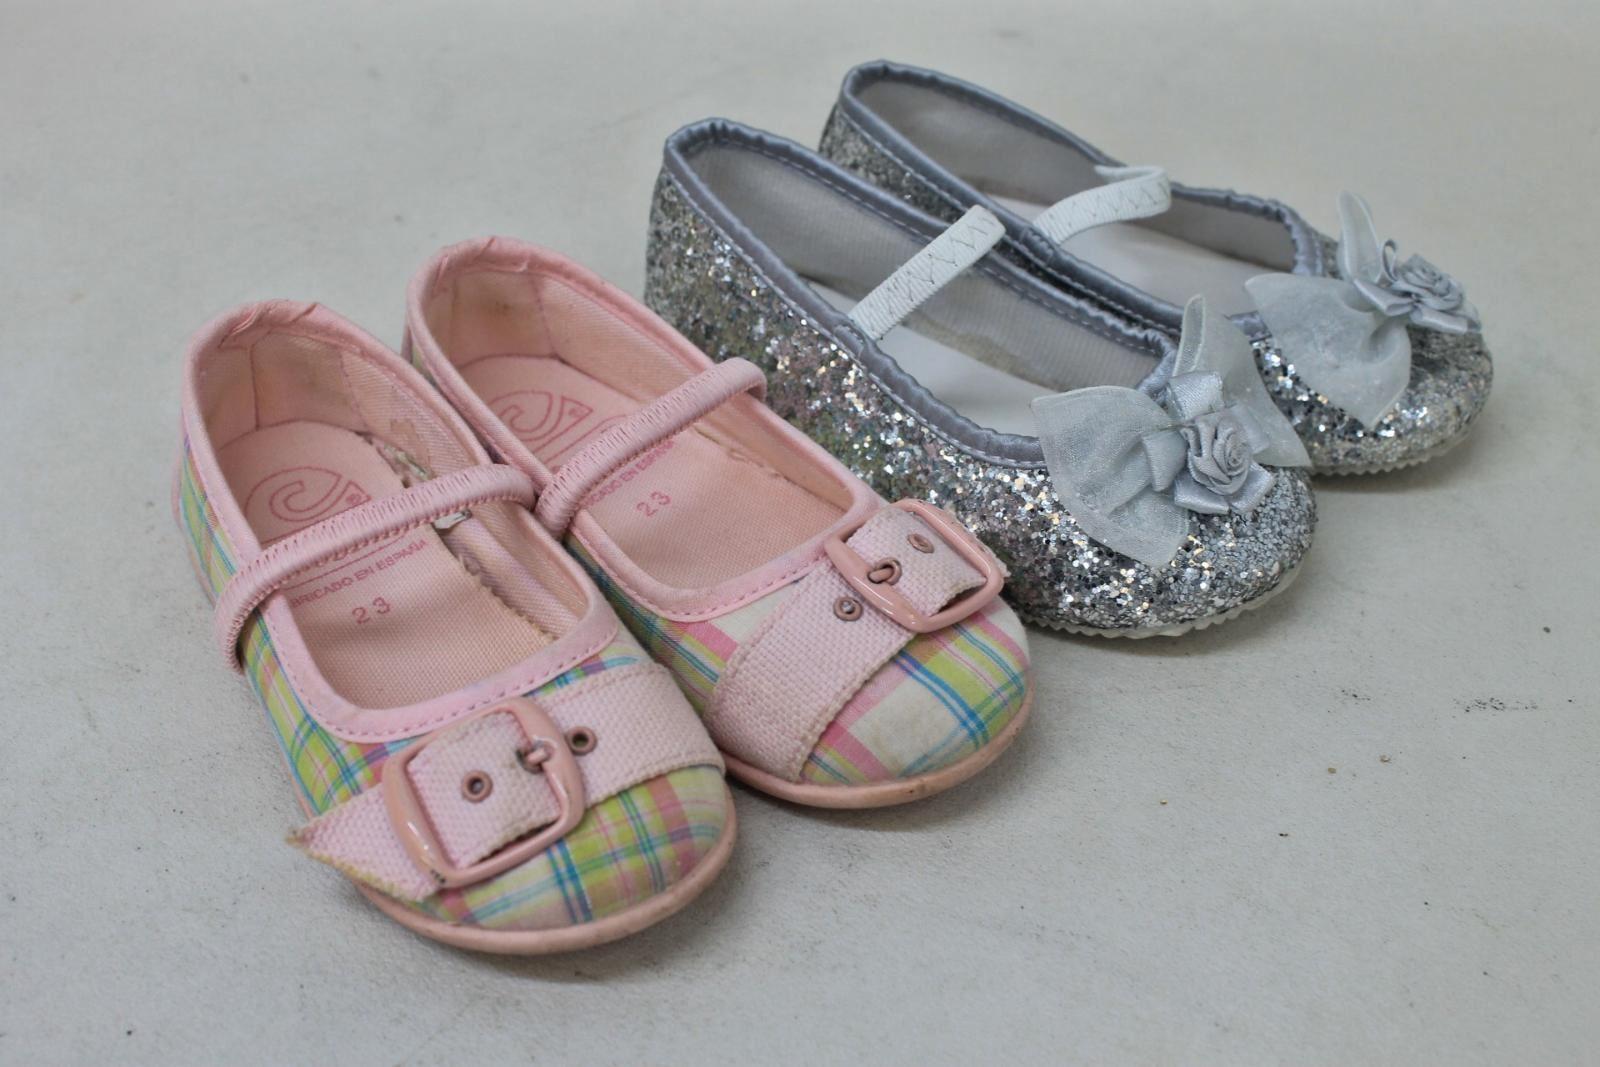 2-x-CRIO-Girls-Pink-amp-Silver-Ballerina-Mary-Jane-Flat-Shoes-Size-UK6-7-EU23